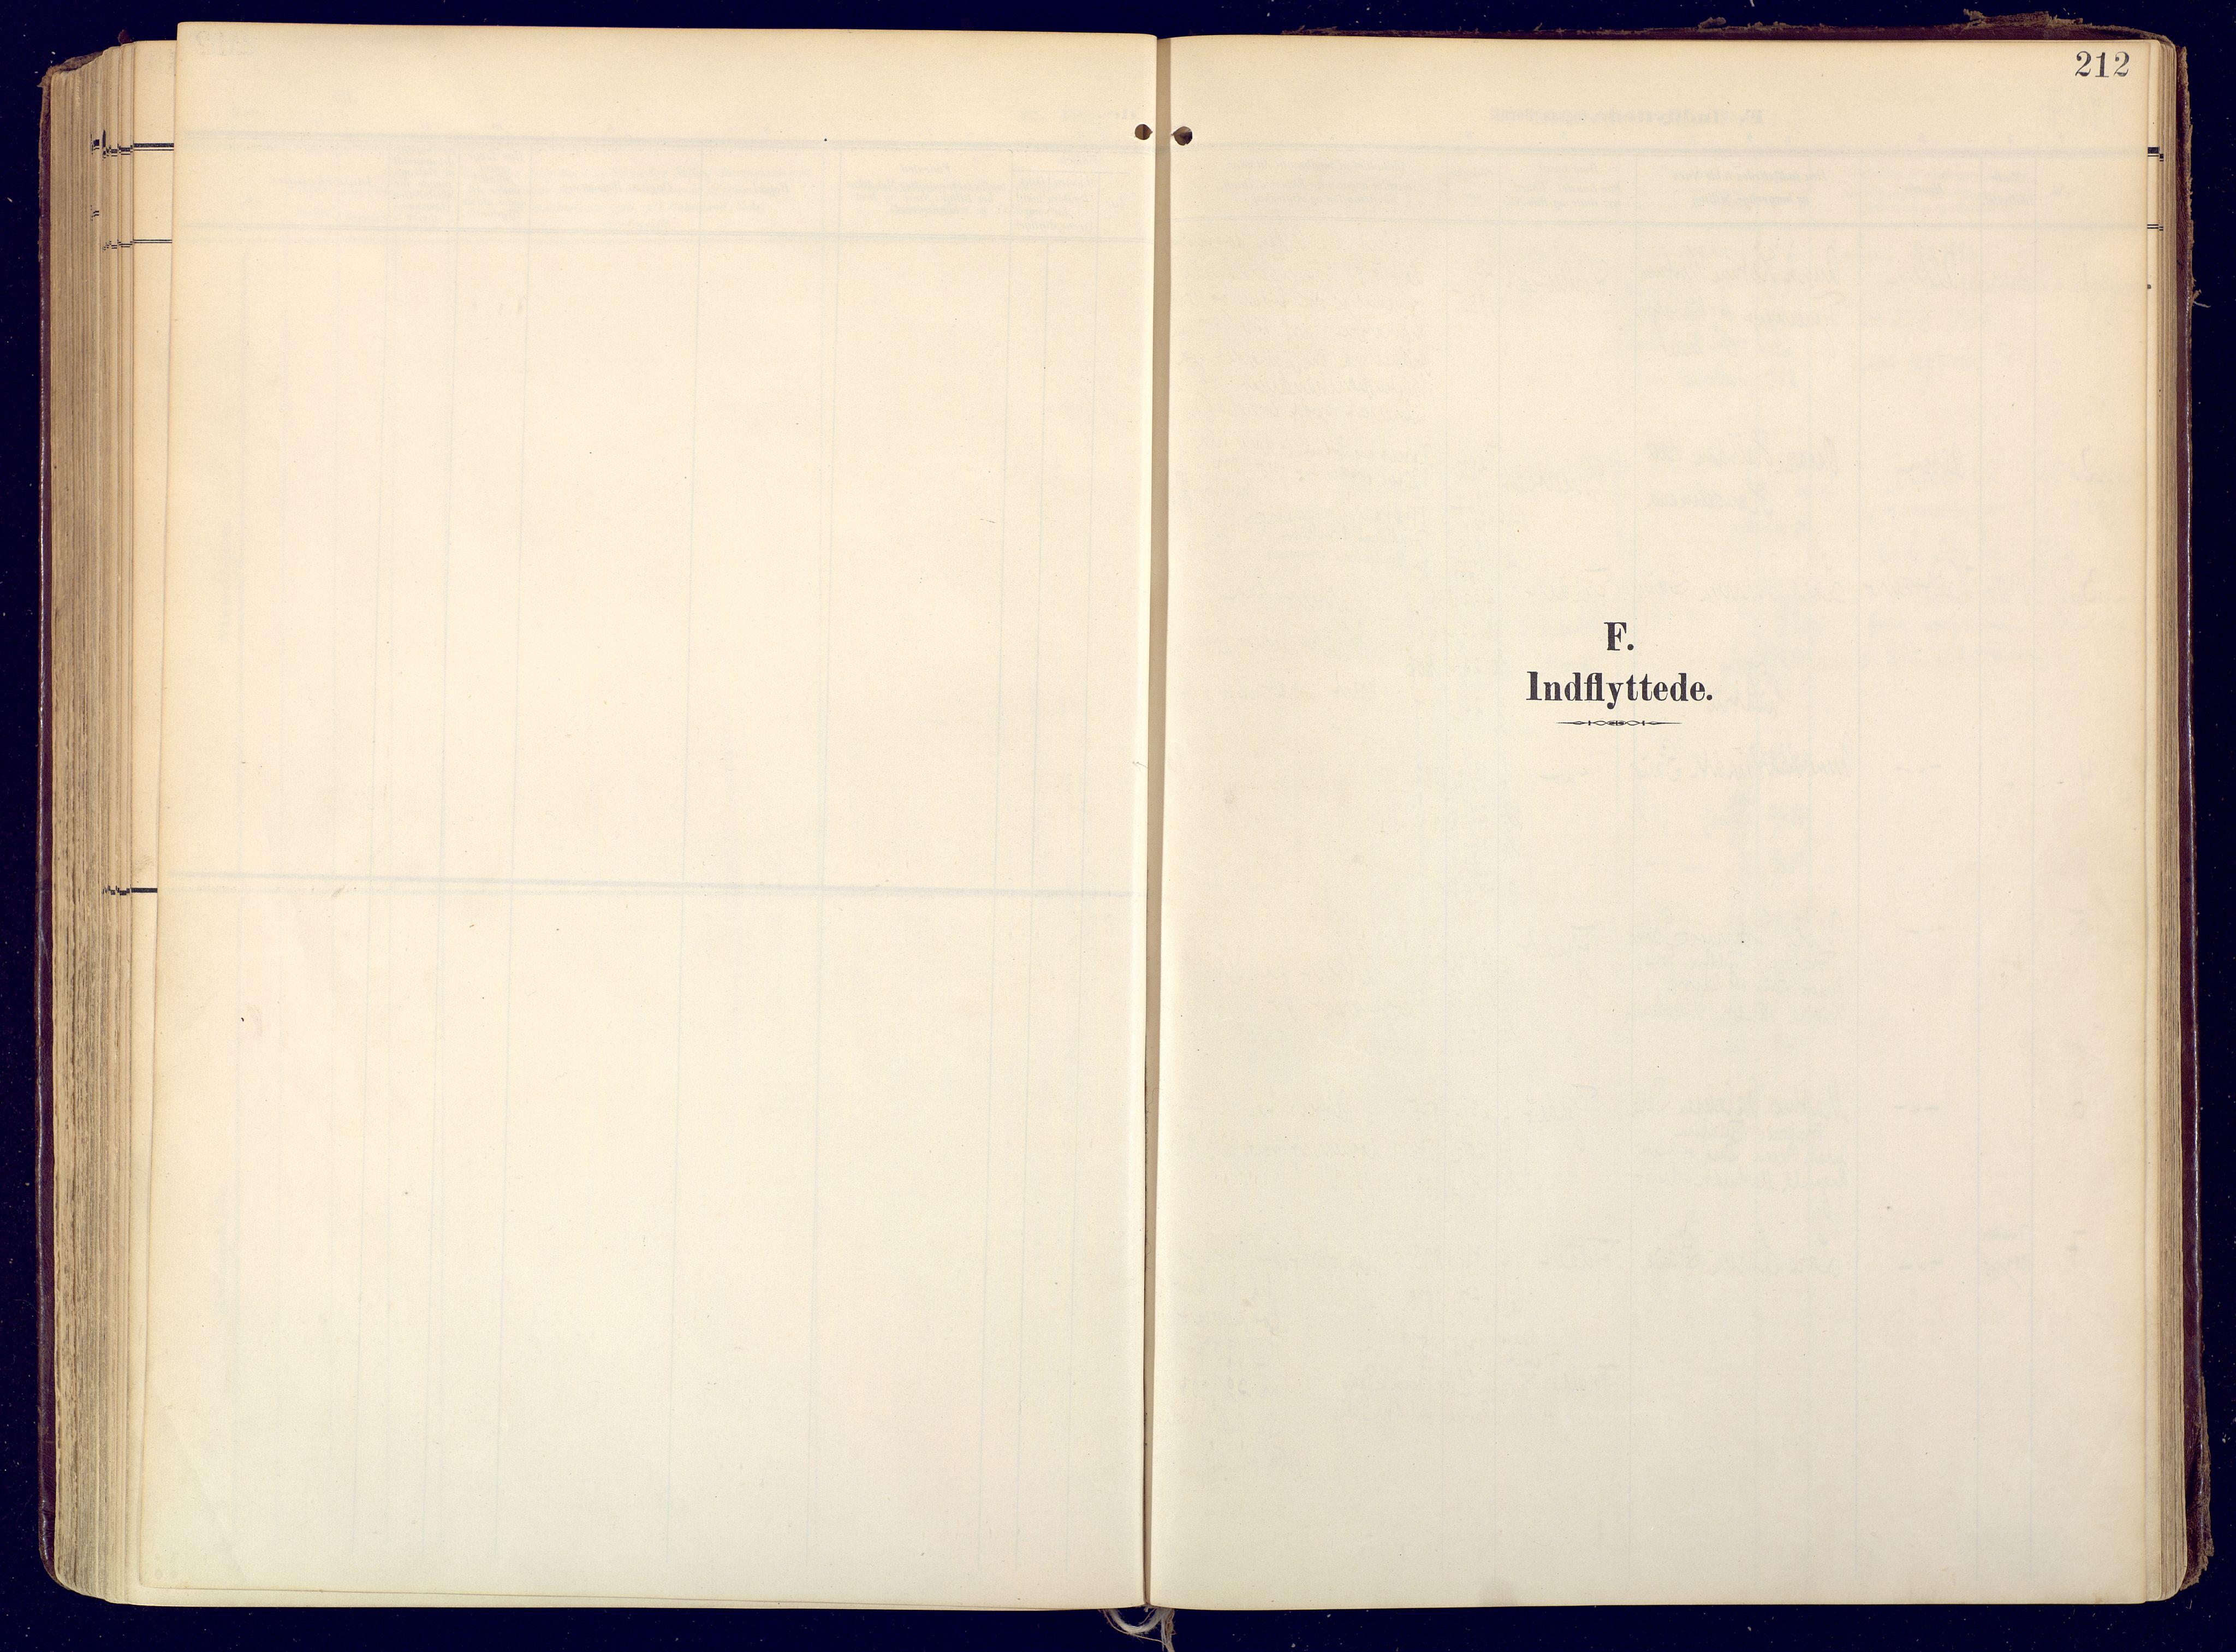 SATØ, Karasjok sokneprestkontor, H/Ha: Ministerialbok nr. 3, 1907-1926, s. 212